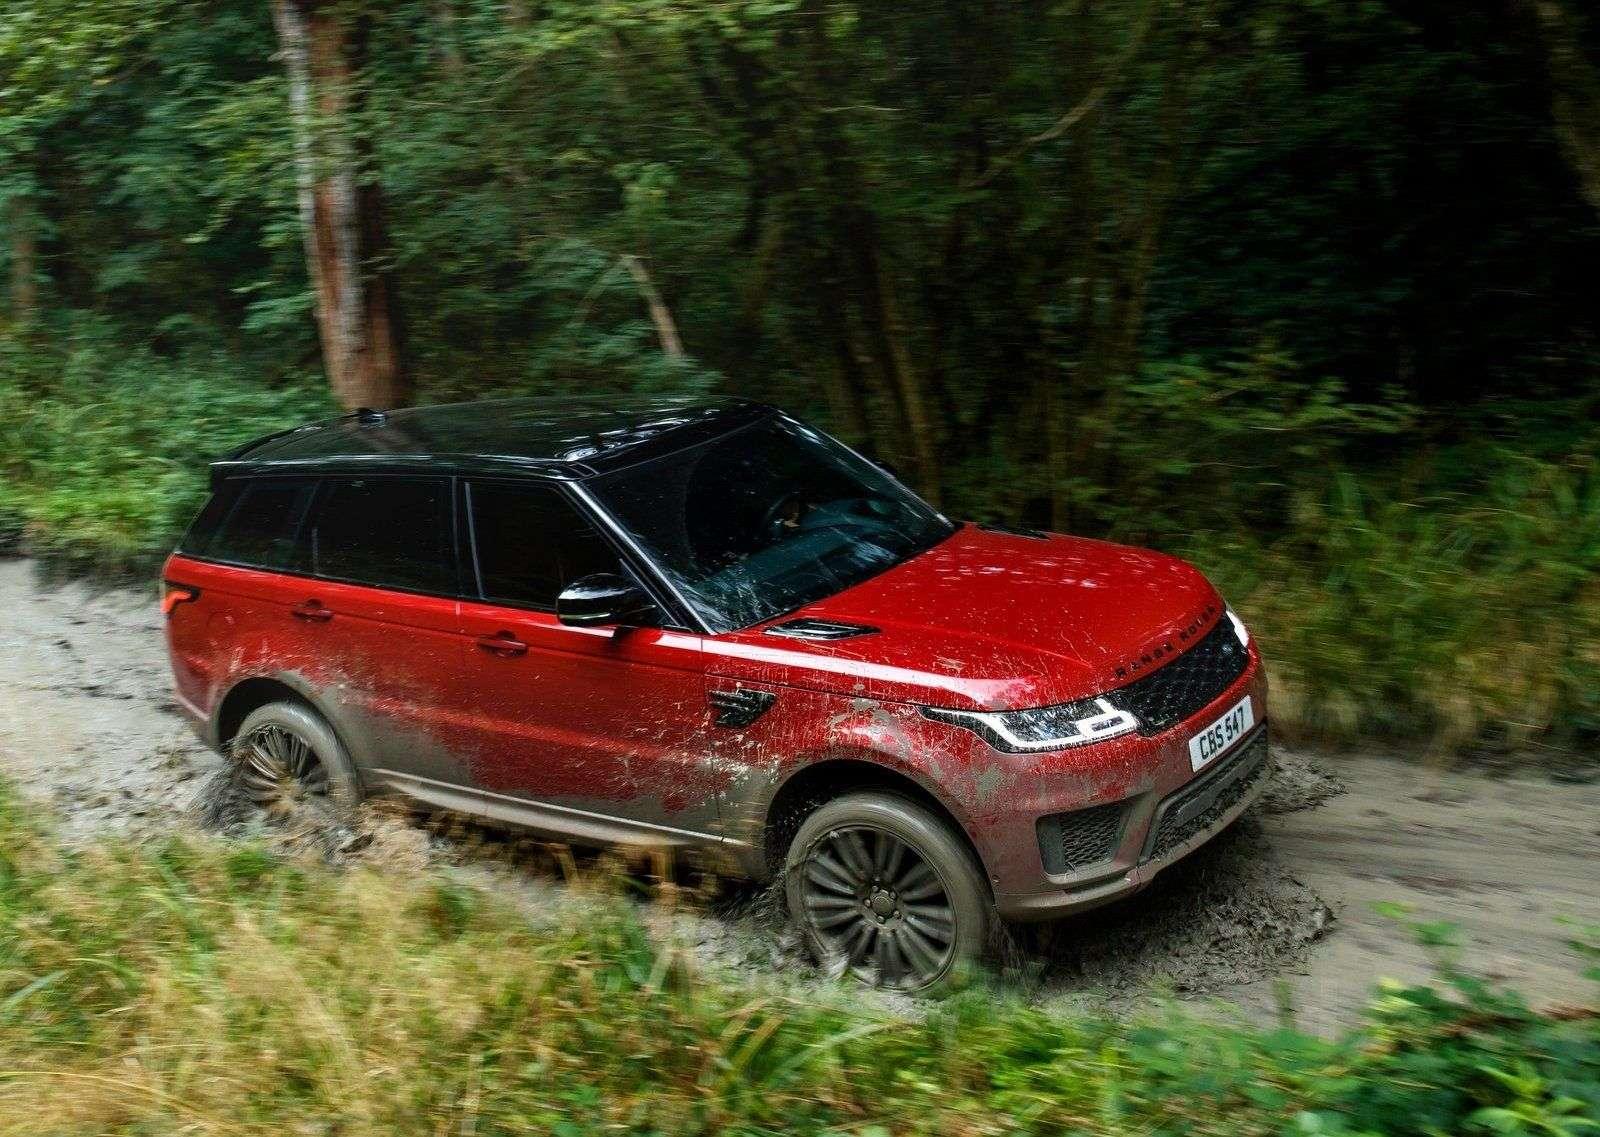 Обзор Land Rover Range Rover Sport 2018: характеристики, комплектации и цена